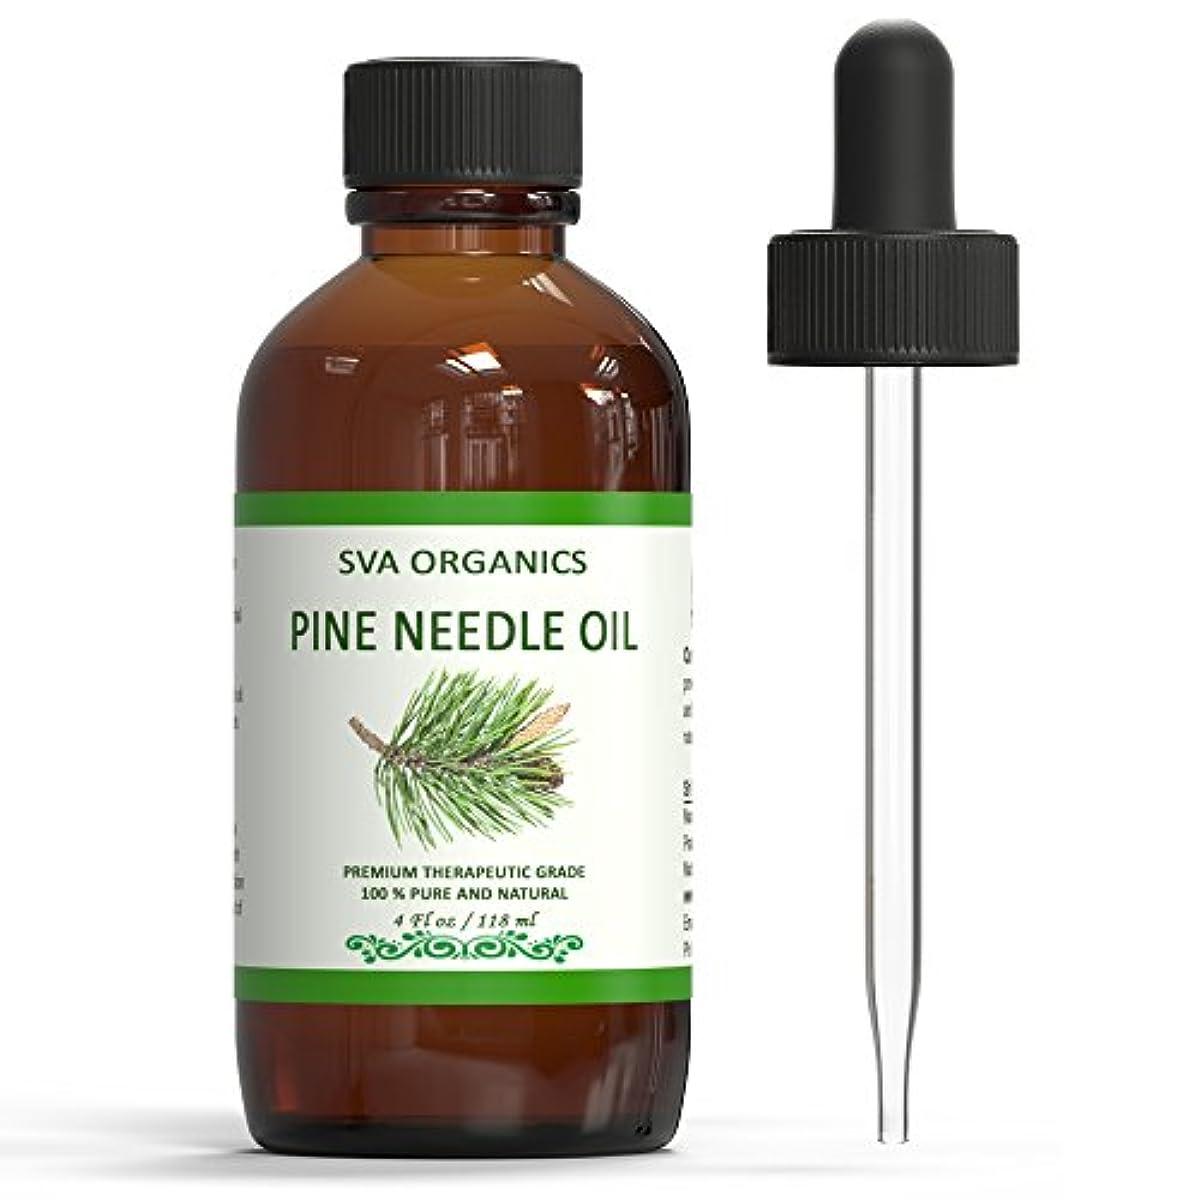 SVA ORGANICS Pine Needle Essential Oil Large Size 4 OZ (118 ML) Therapeutic Grade, 100% Pure Premium Grade Oil for Skin and Hair Care